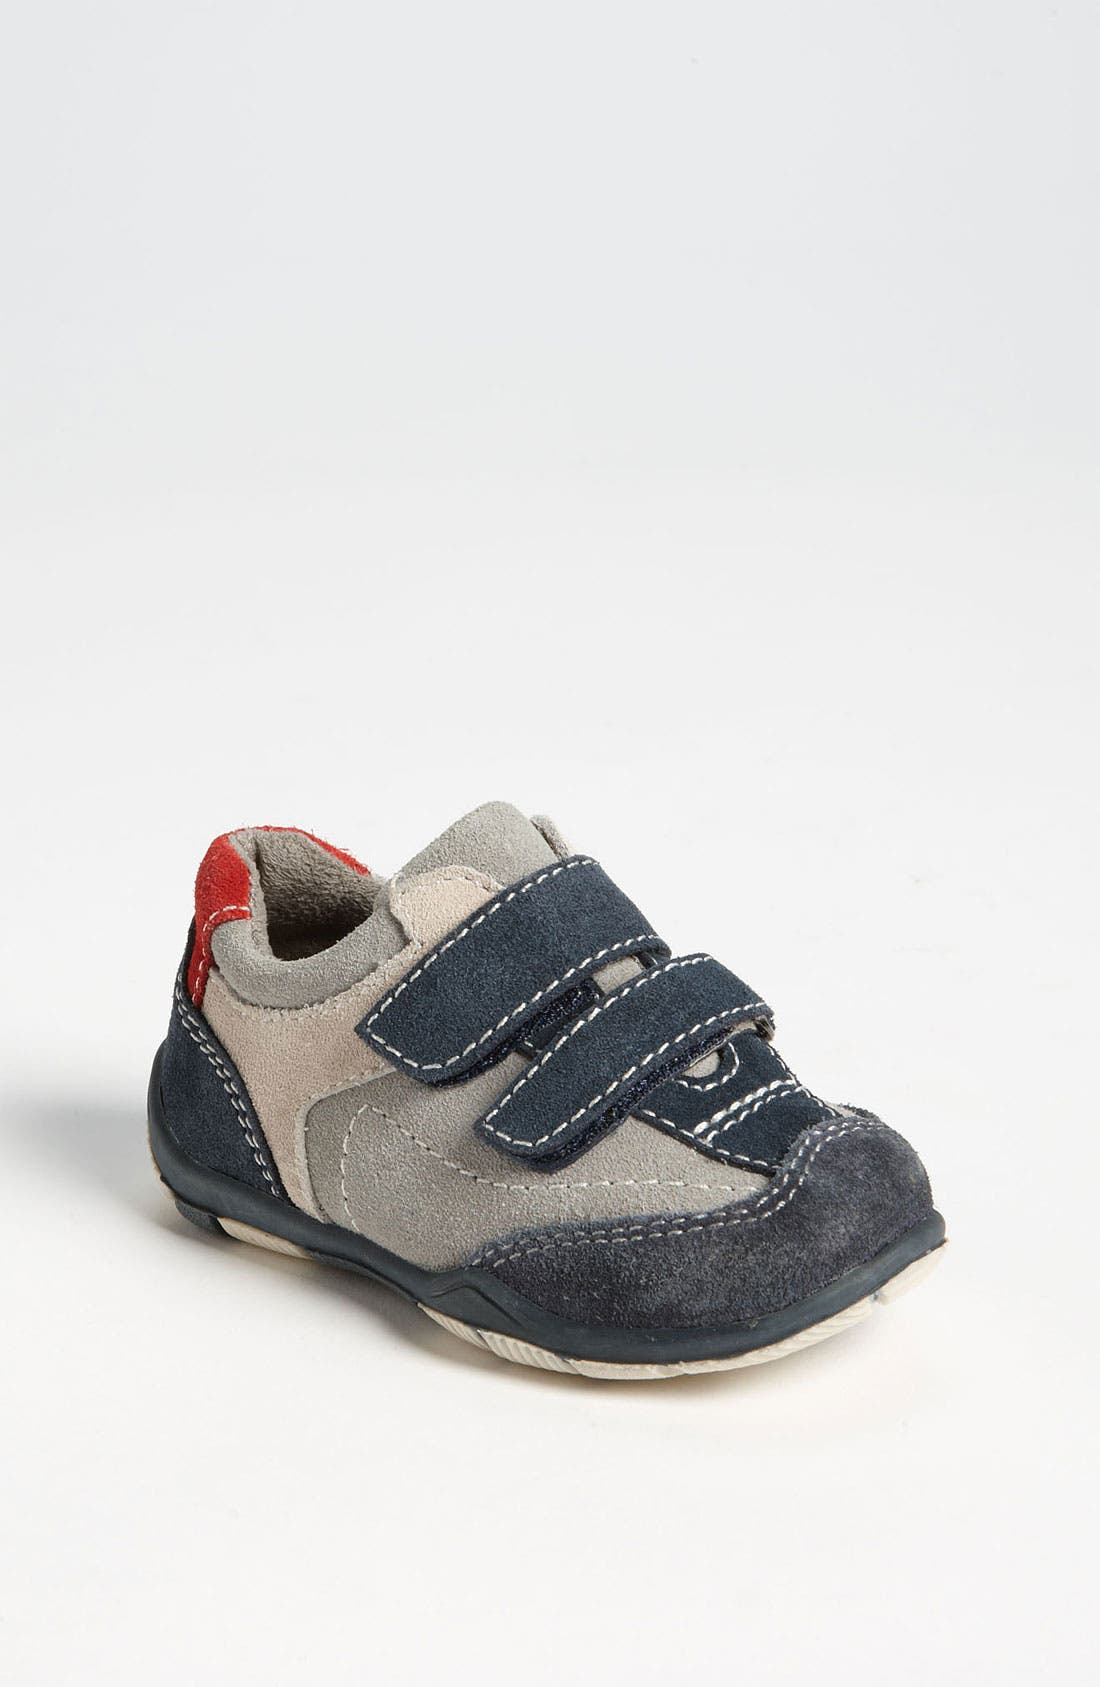 Alternate Image 1 Selected - Cole Haan 'Air Conner' Sneaker (Walker & Toddler)